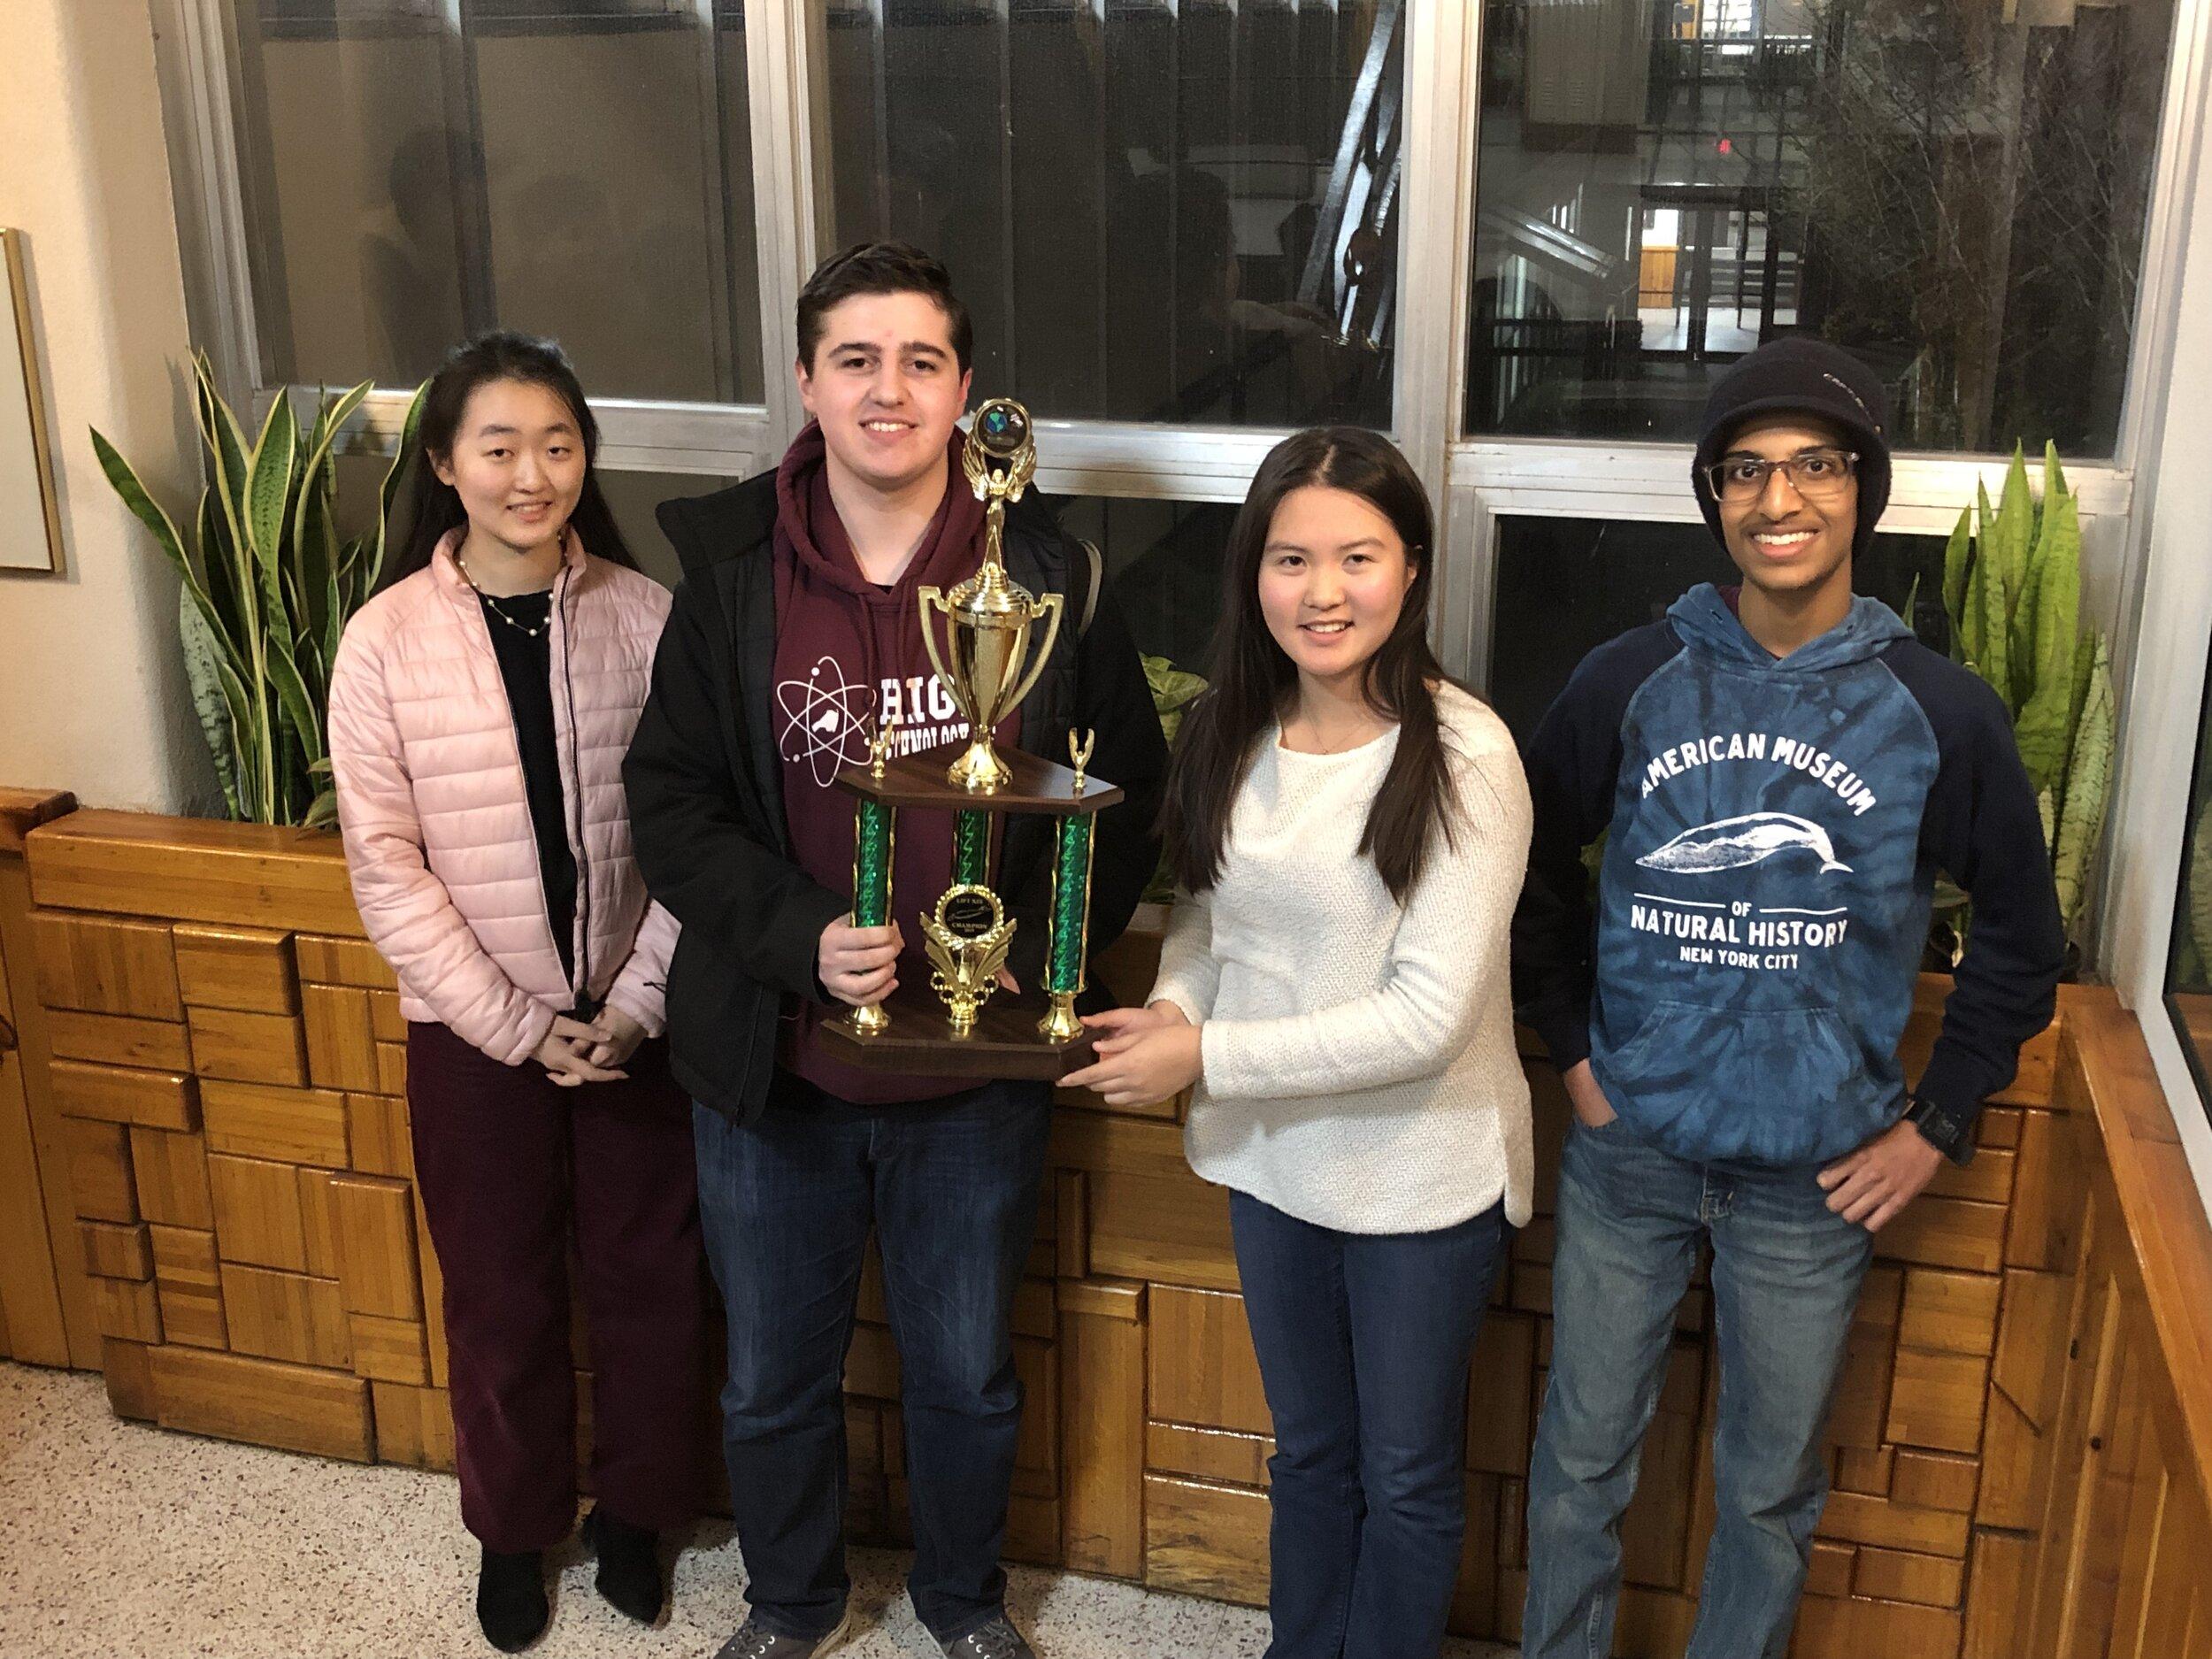 High Tech A-Team: Selena Liu, Frank Grabowski, Karen Li, and Deepak Gopalakrishnan